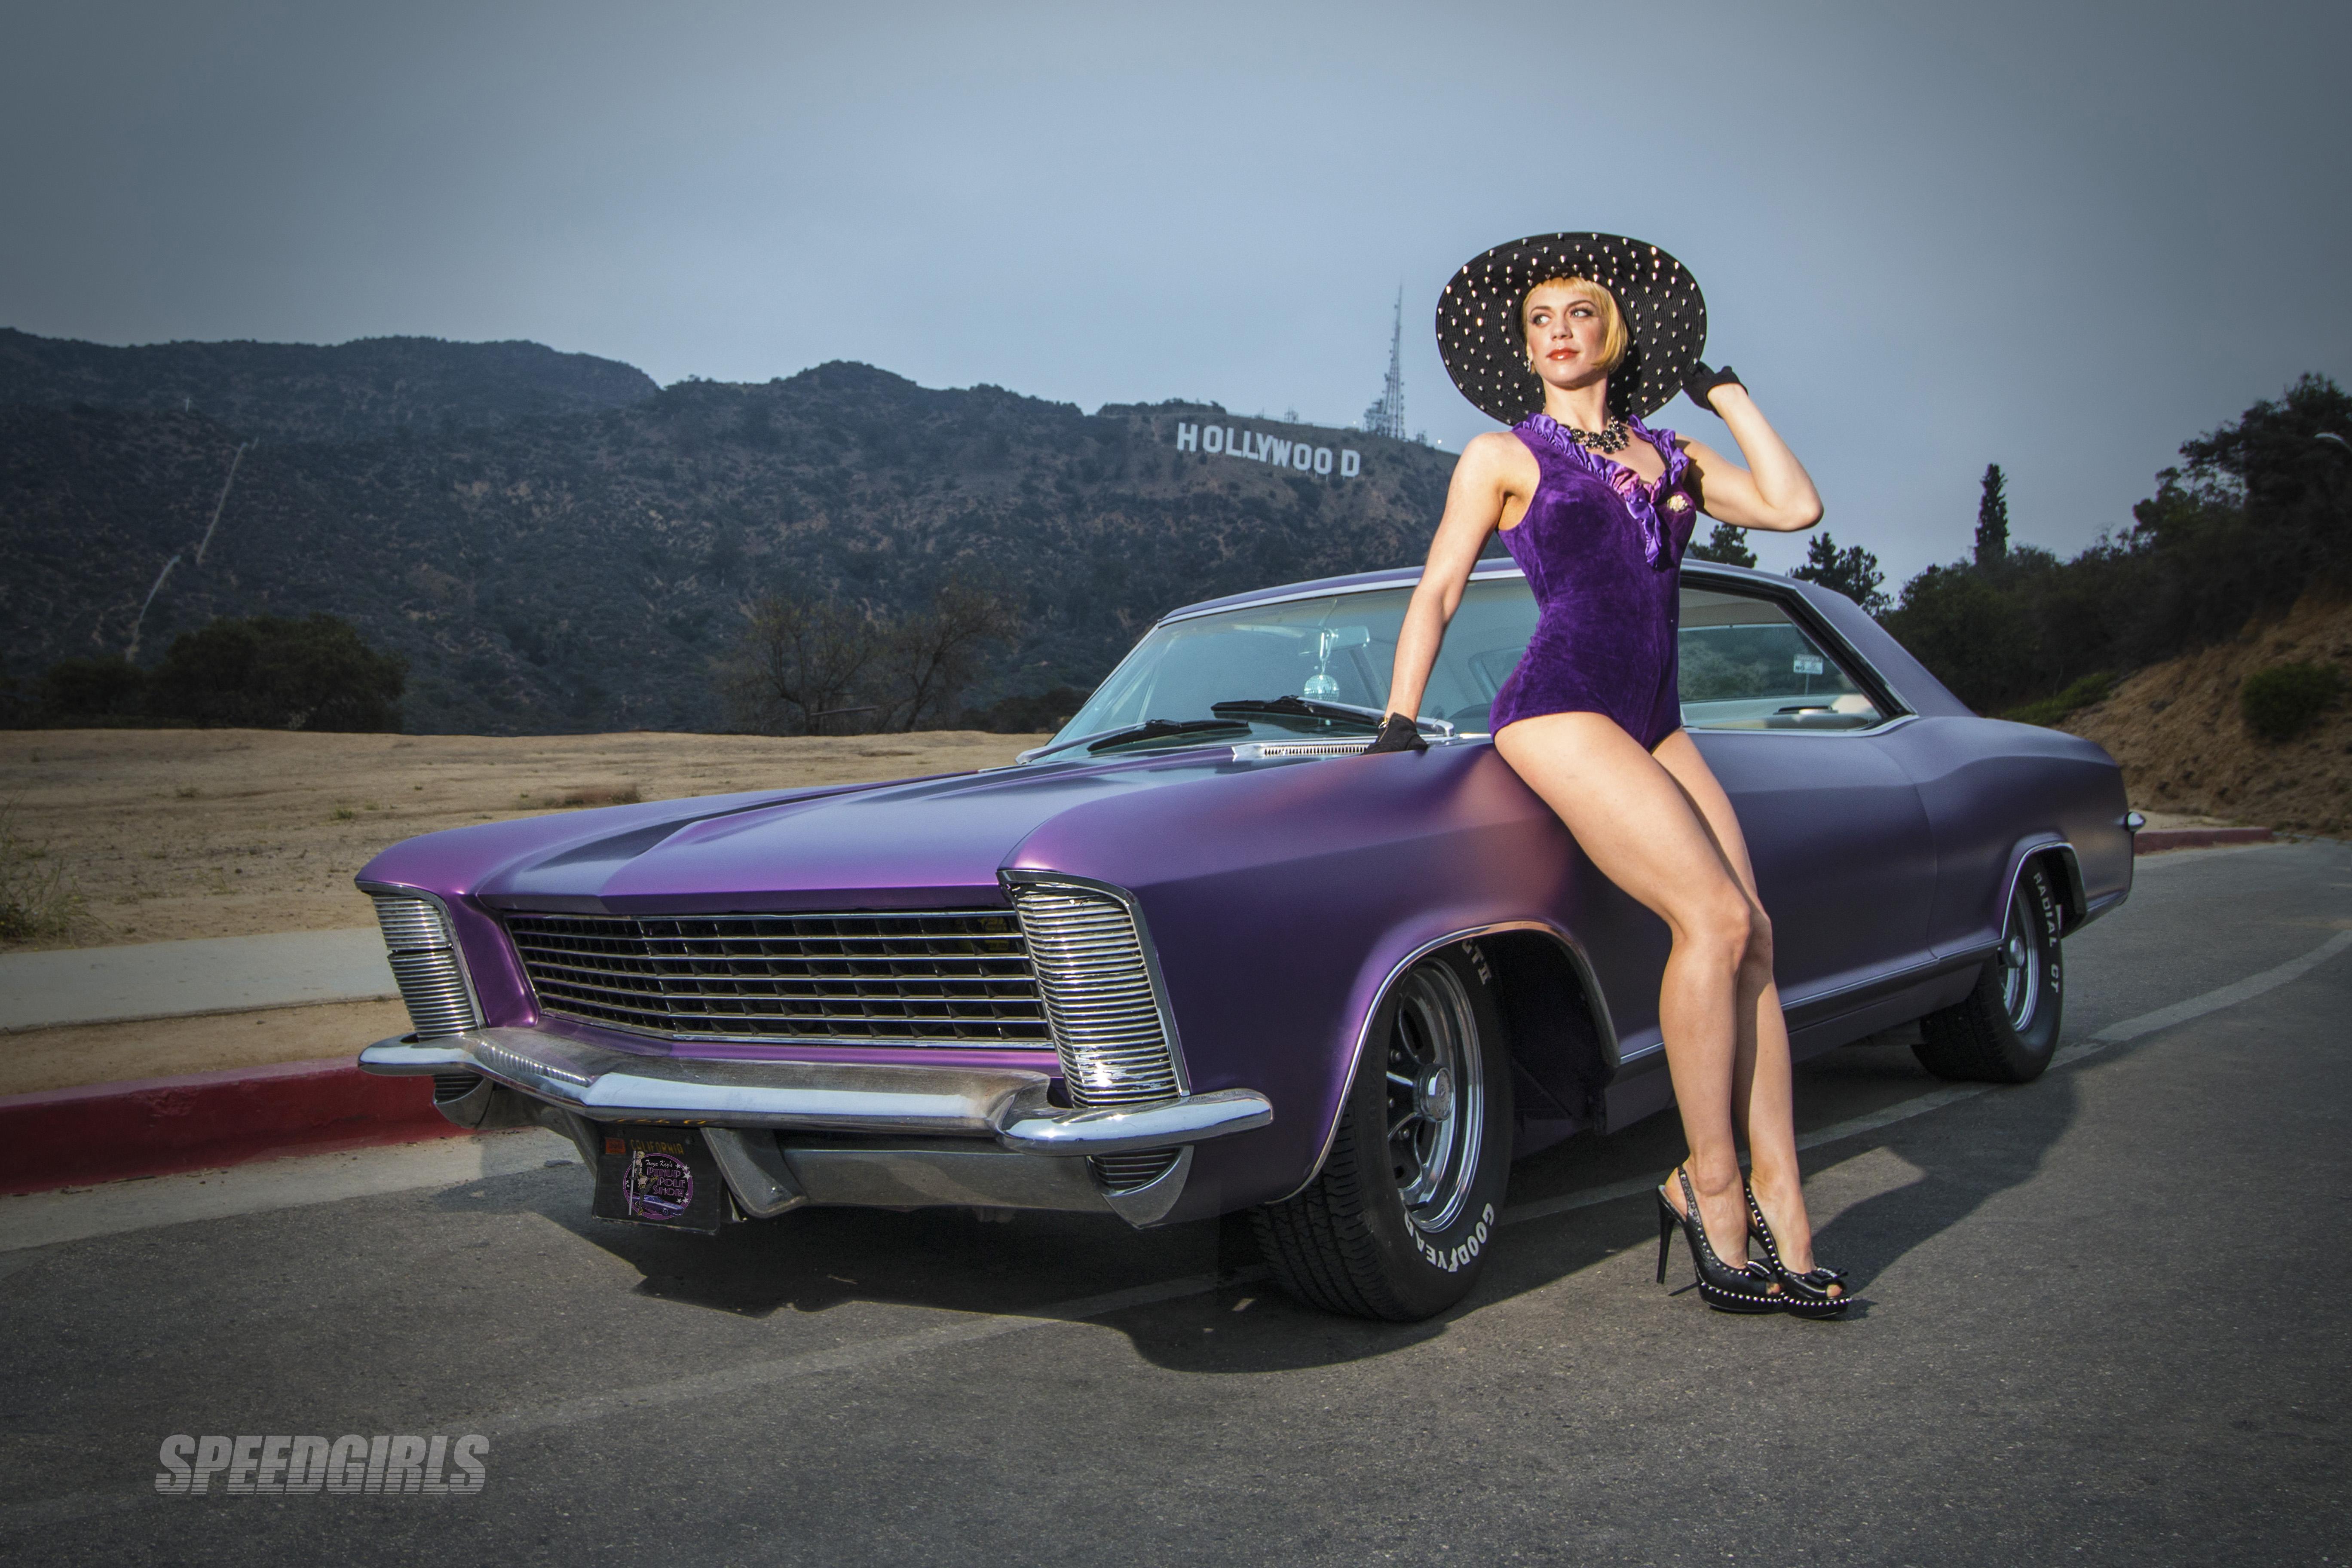 pin mopar muscle car - photo #38